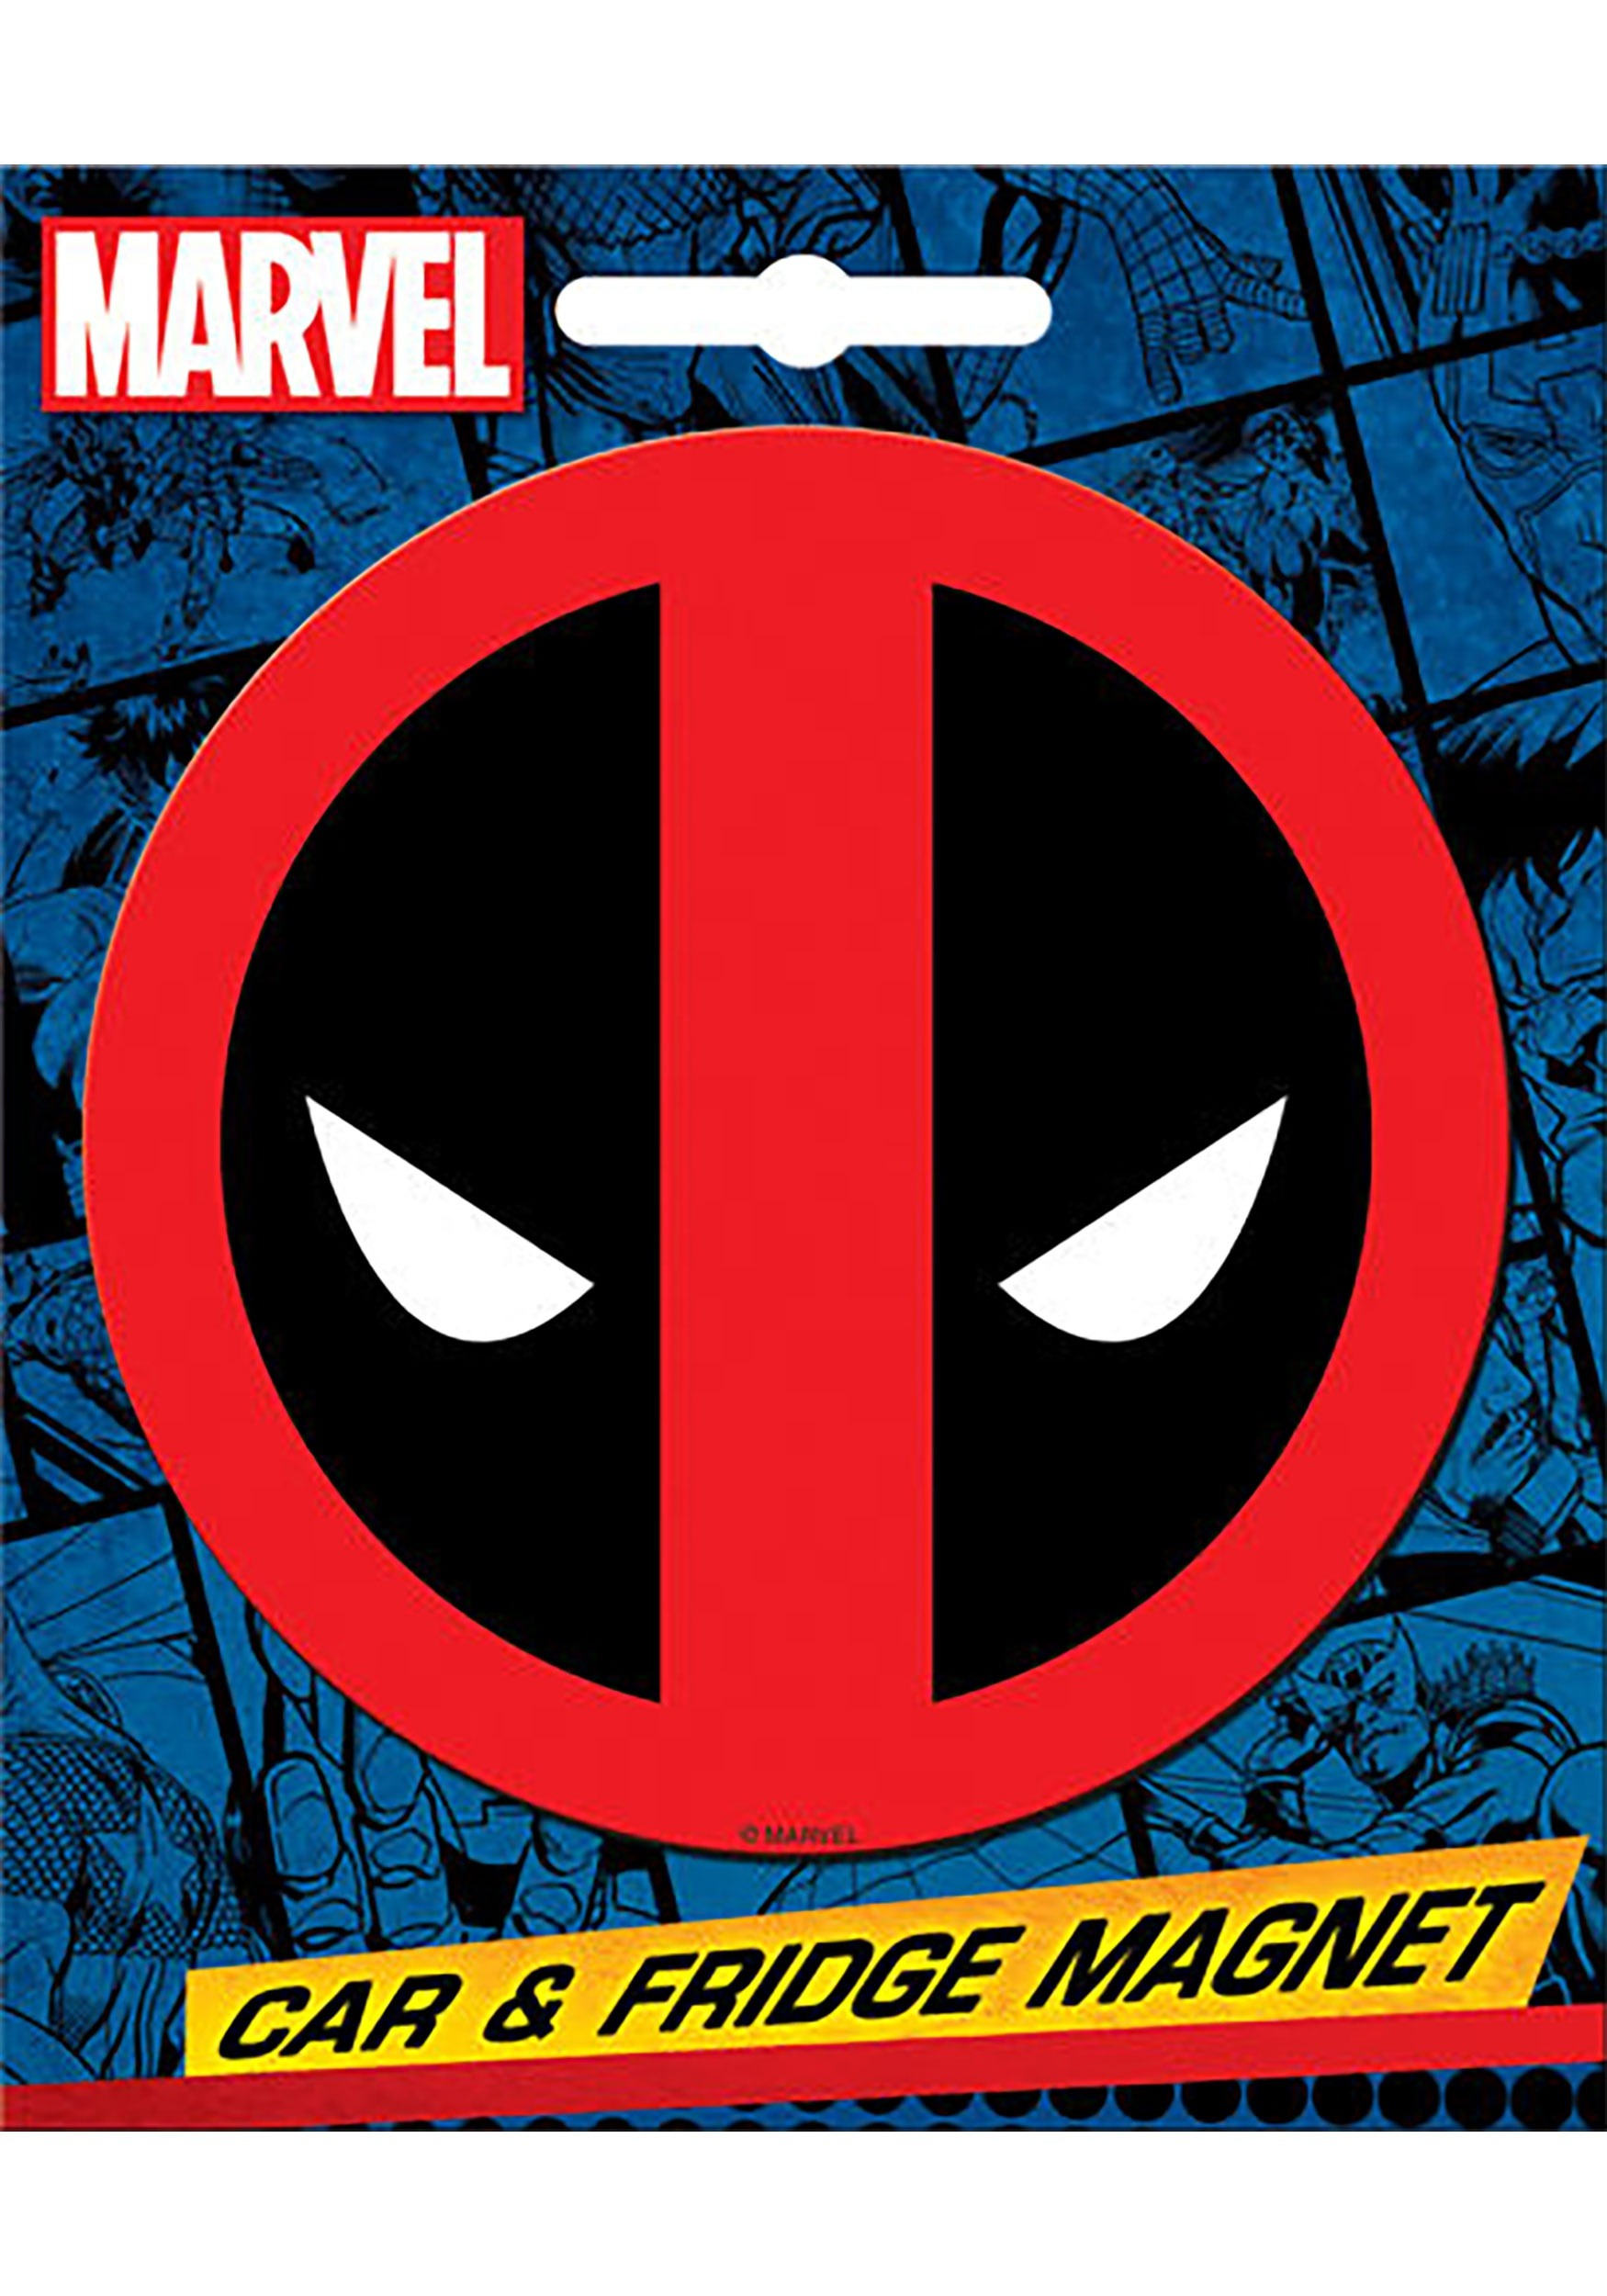 Marvel_Deadpool_Car_Magnet